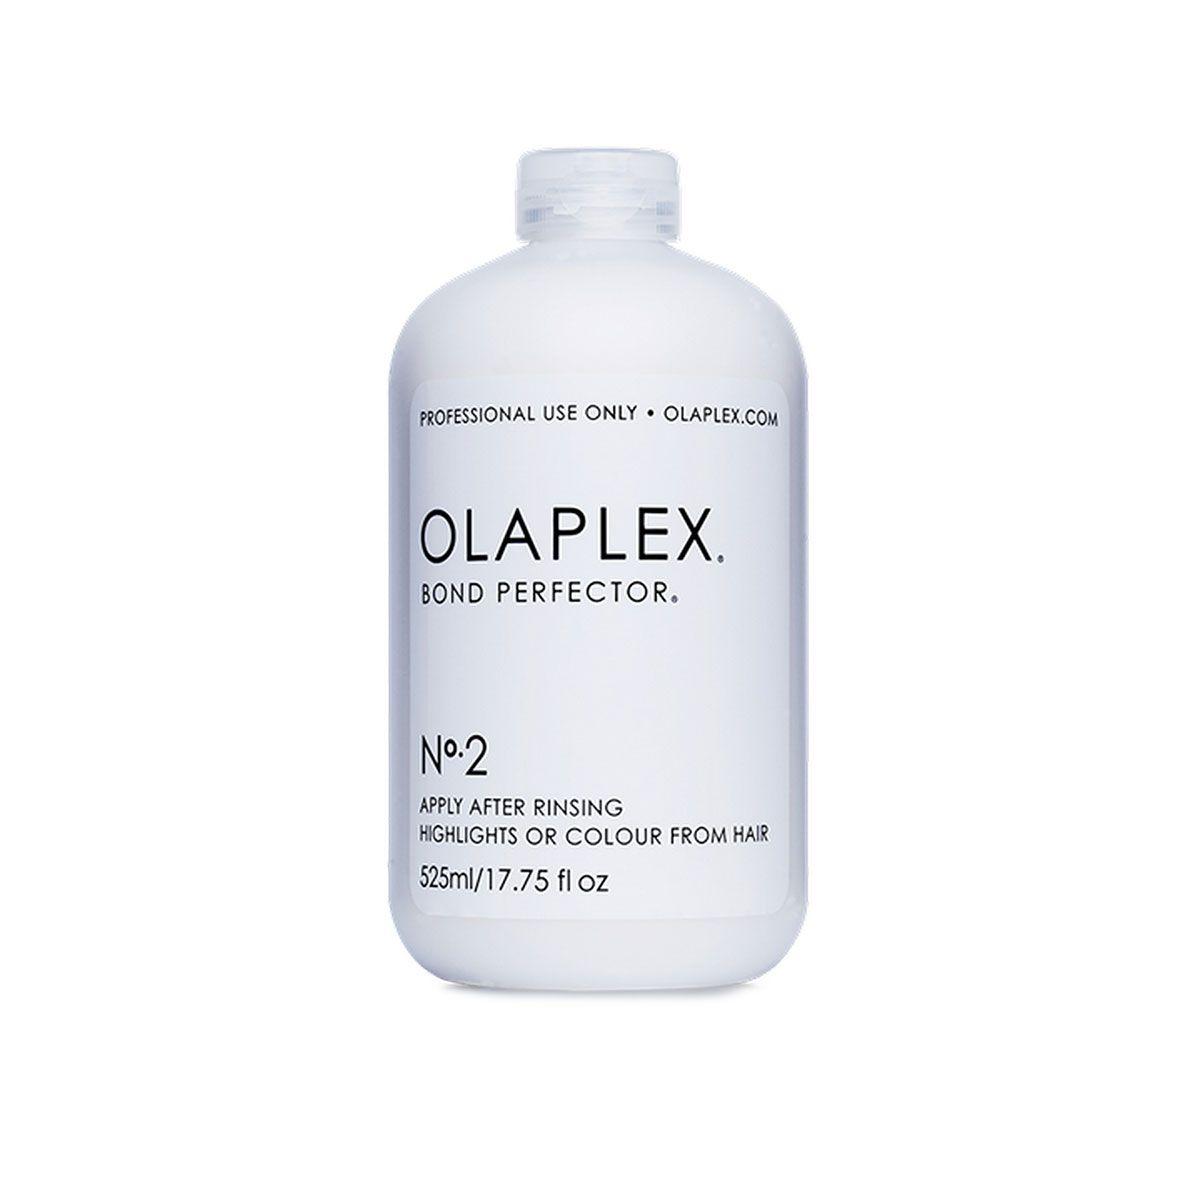 Olaplex Bond Perfector